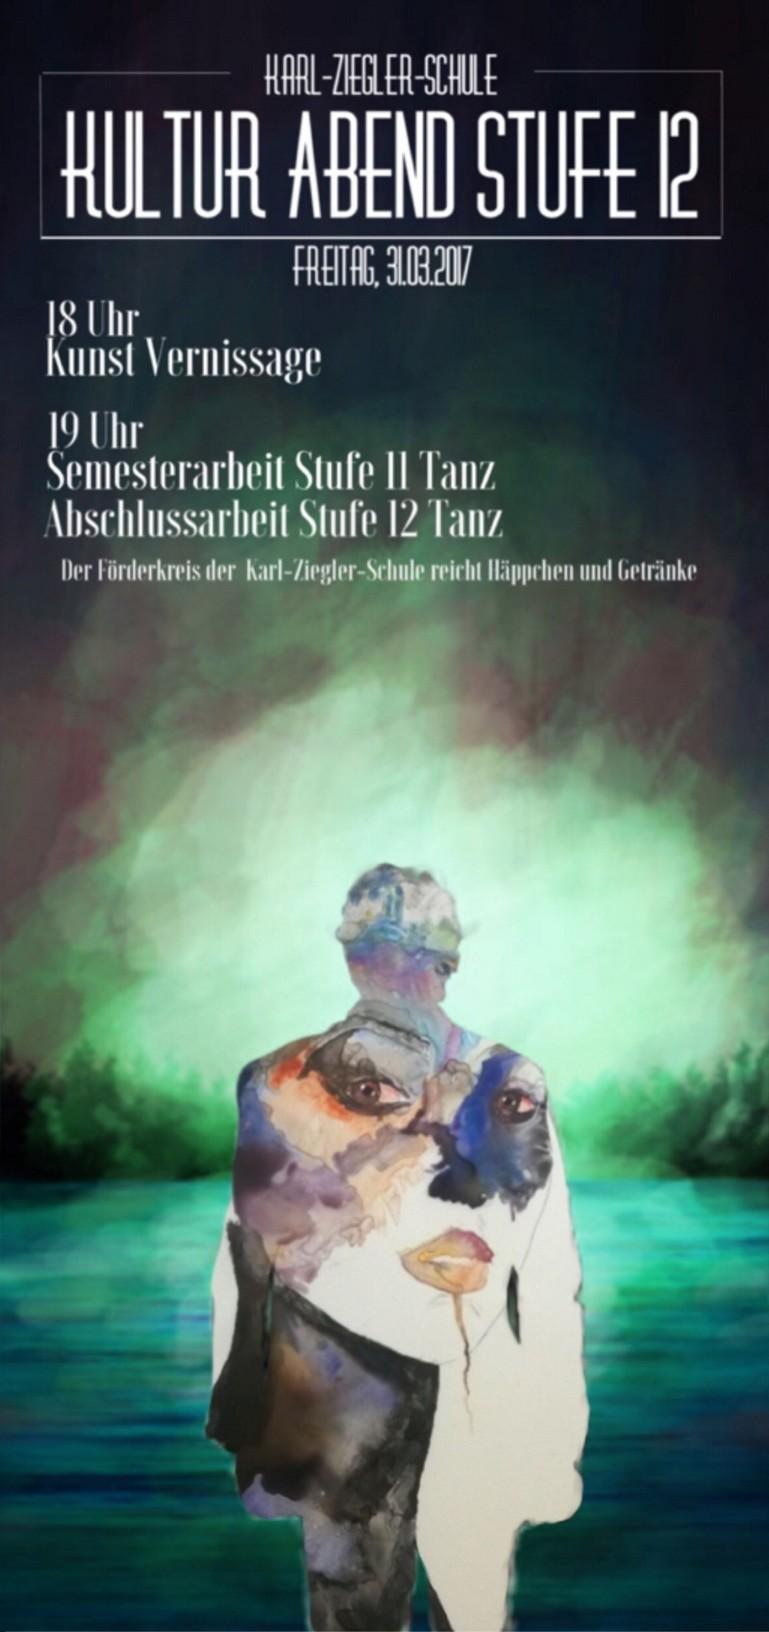 KuMuLiTa_KulturabendMrz2017_Karte_Julia_Steffan